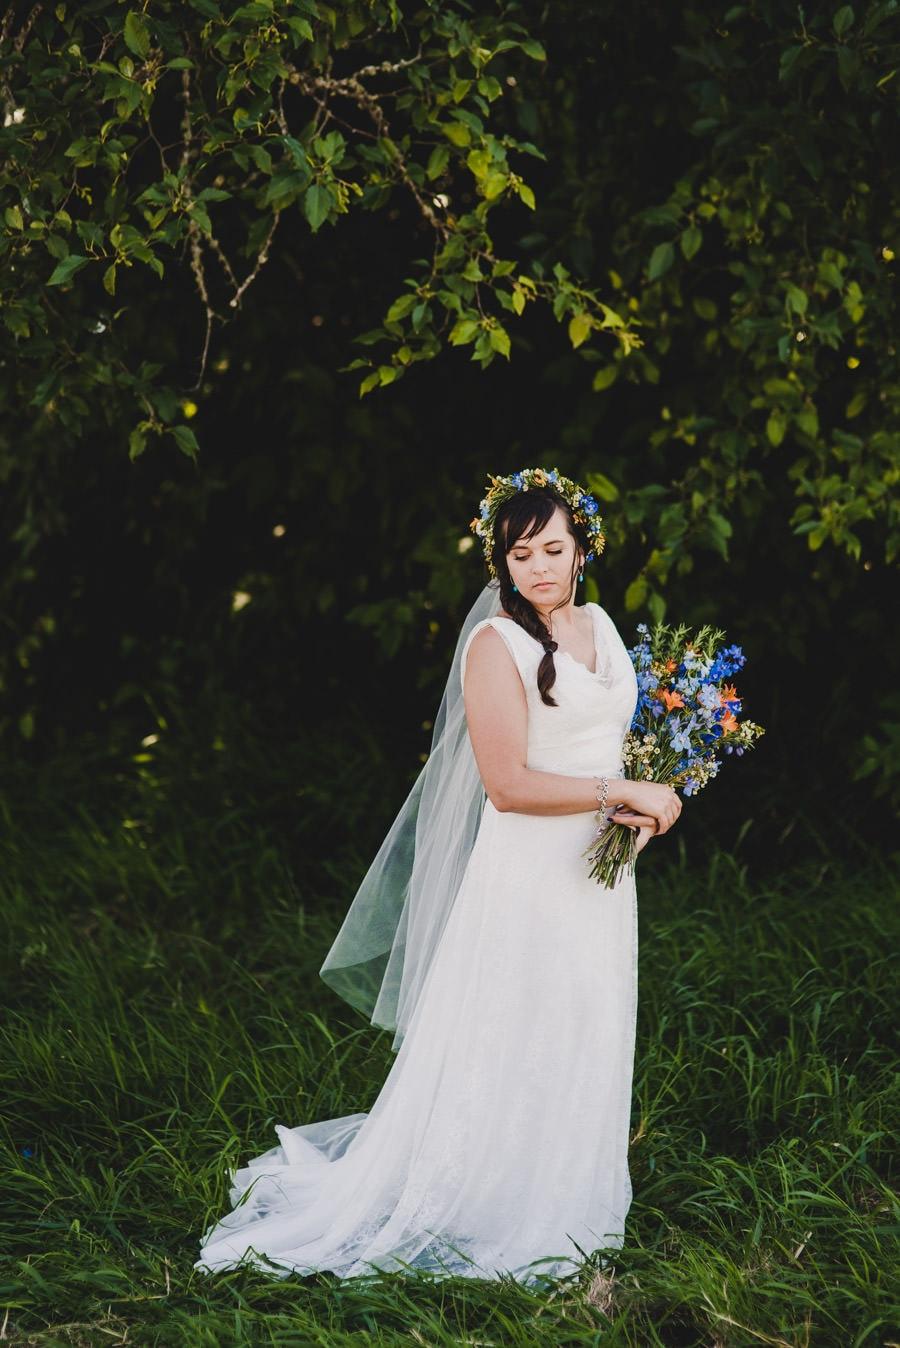 Pendleton blanket adorned backyard wedding for Wedding dresses eugene oregon